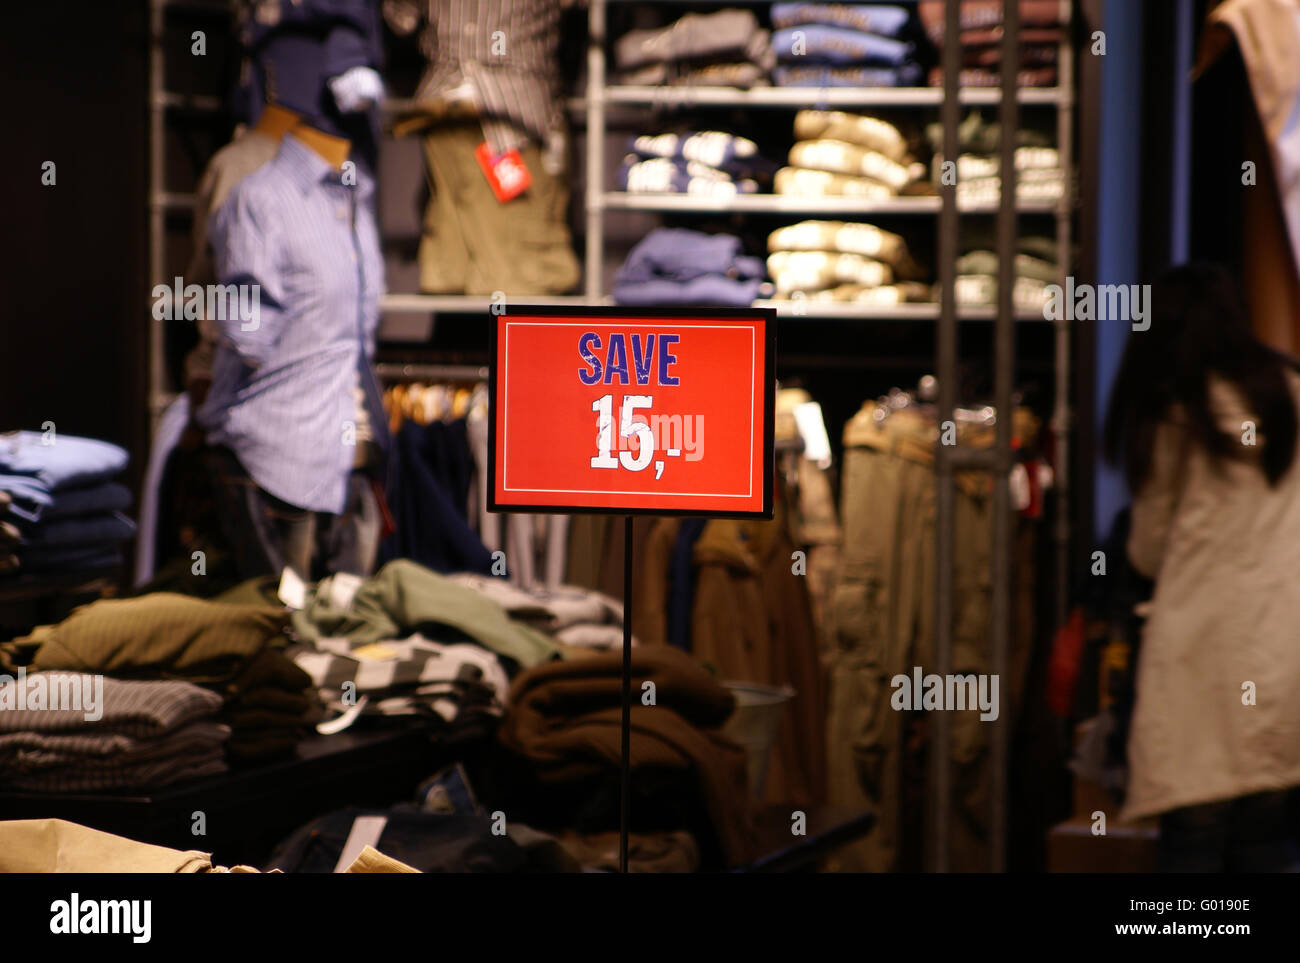 Save - Stock Image